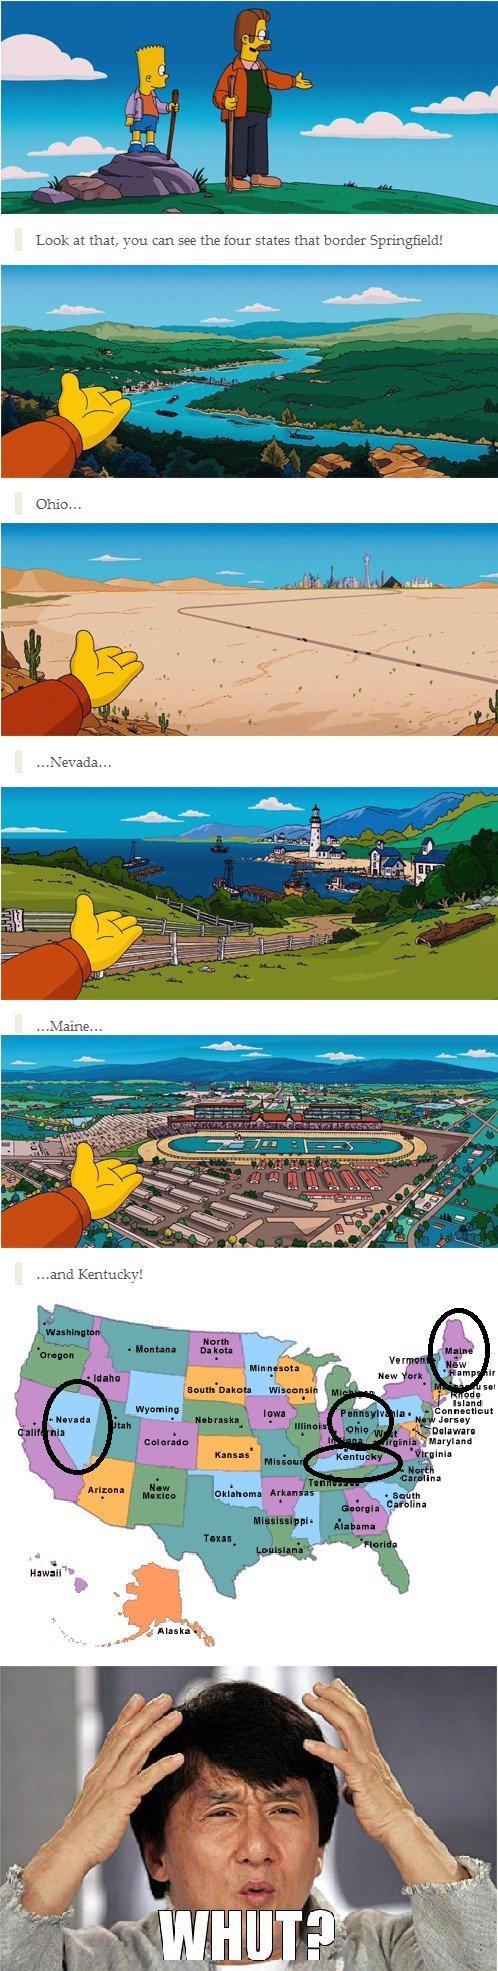 Simpsons Movie. . EHW: -truer!. it's a cartoon, who says it should make sense? simpsons